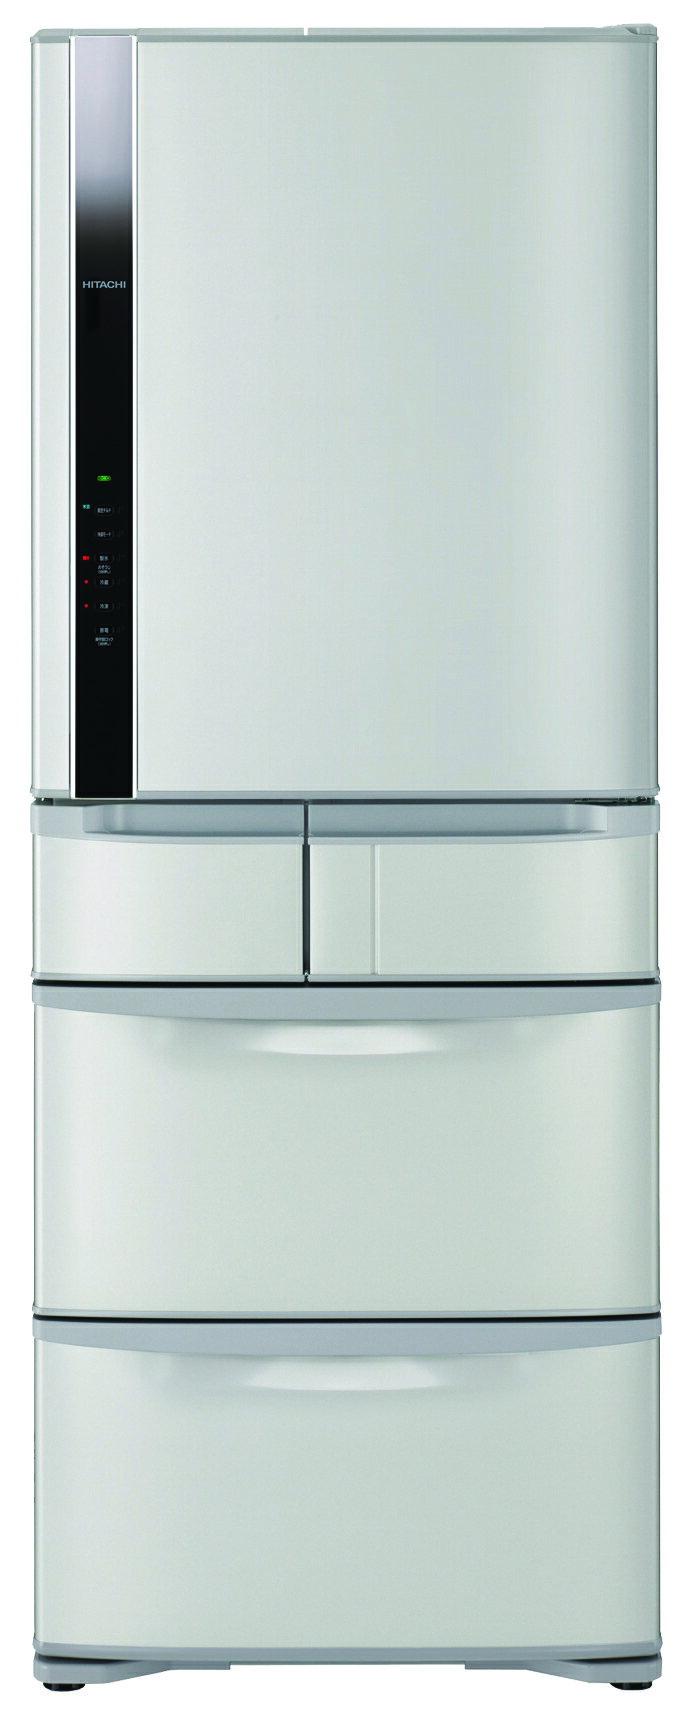 【HITACHI日立】日本原裝變頻477L。五門電冰箱/星燦不銹鋼(RS49FJ)